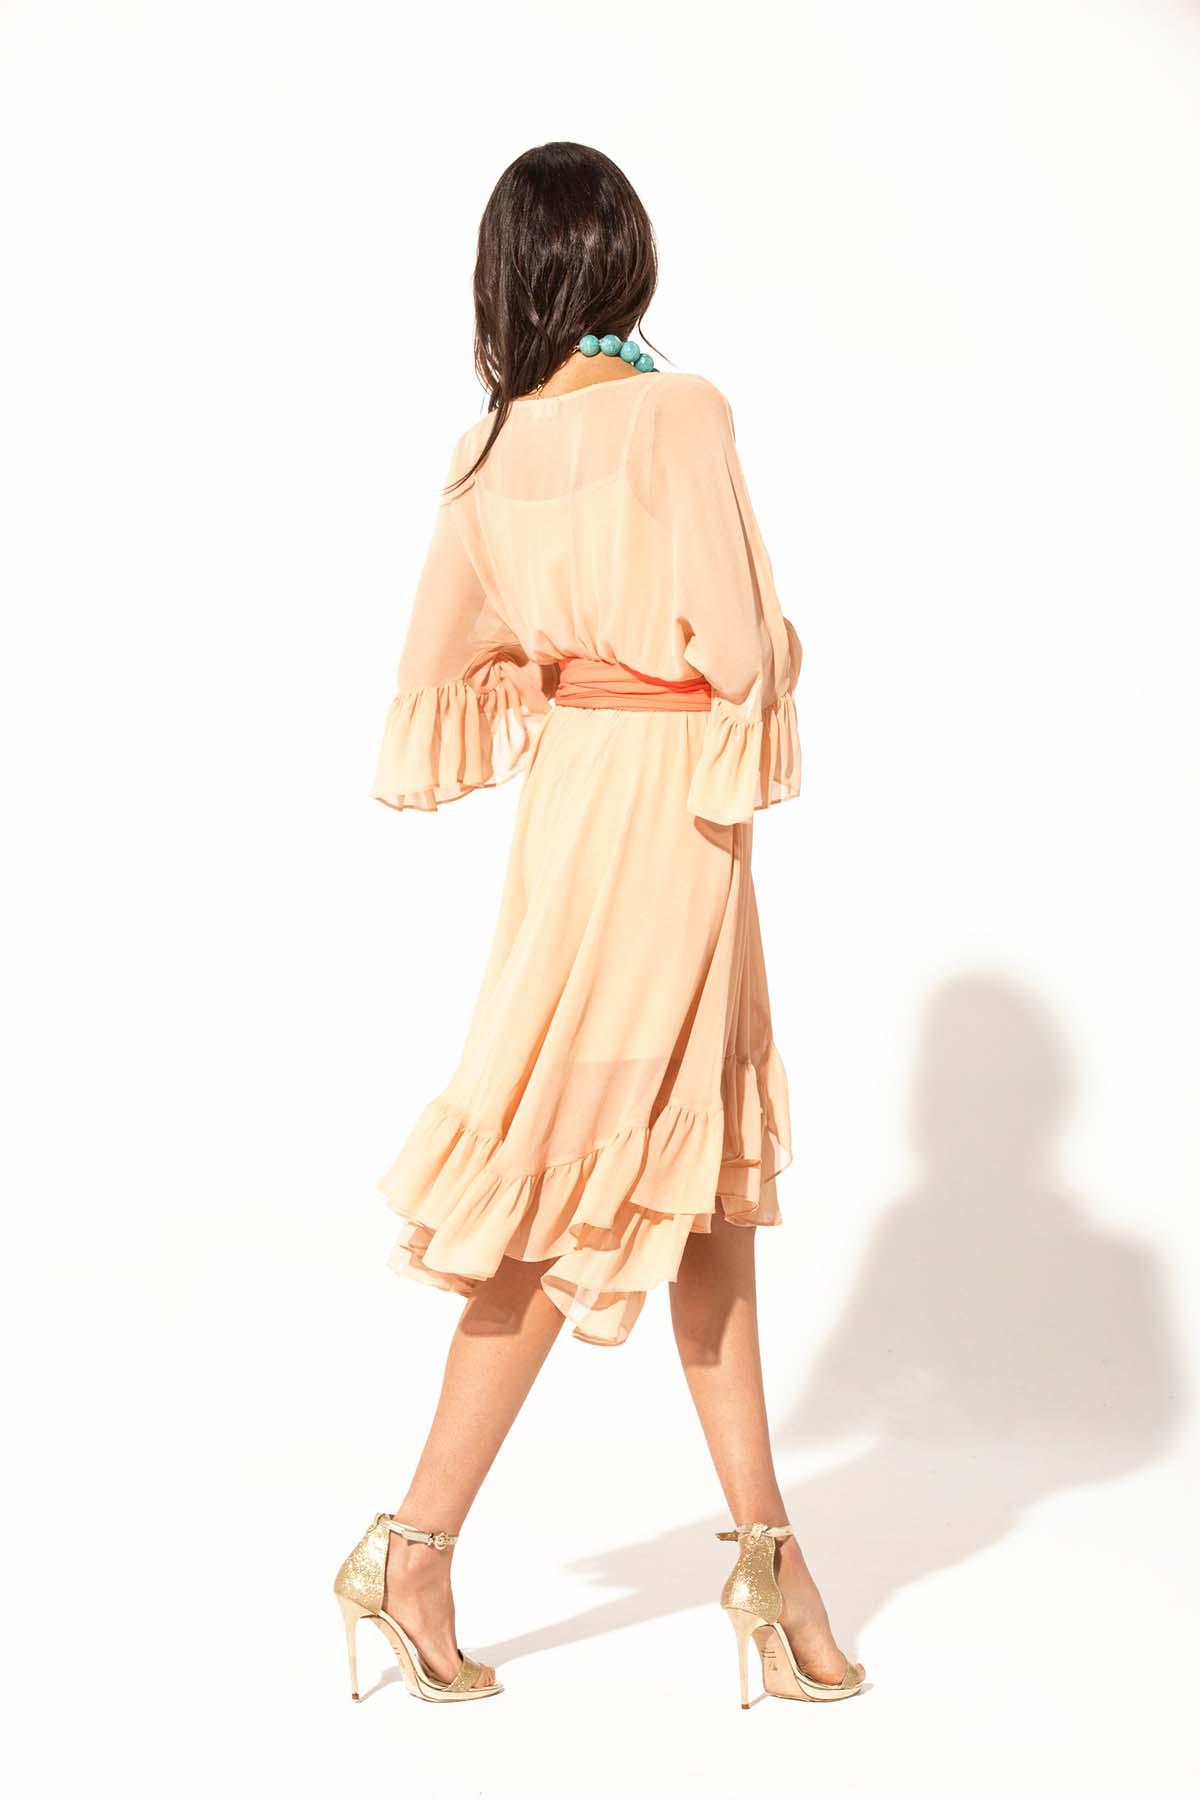 Vestido Vendôme Teria Yabar - Vestido  Vendôme